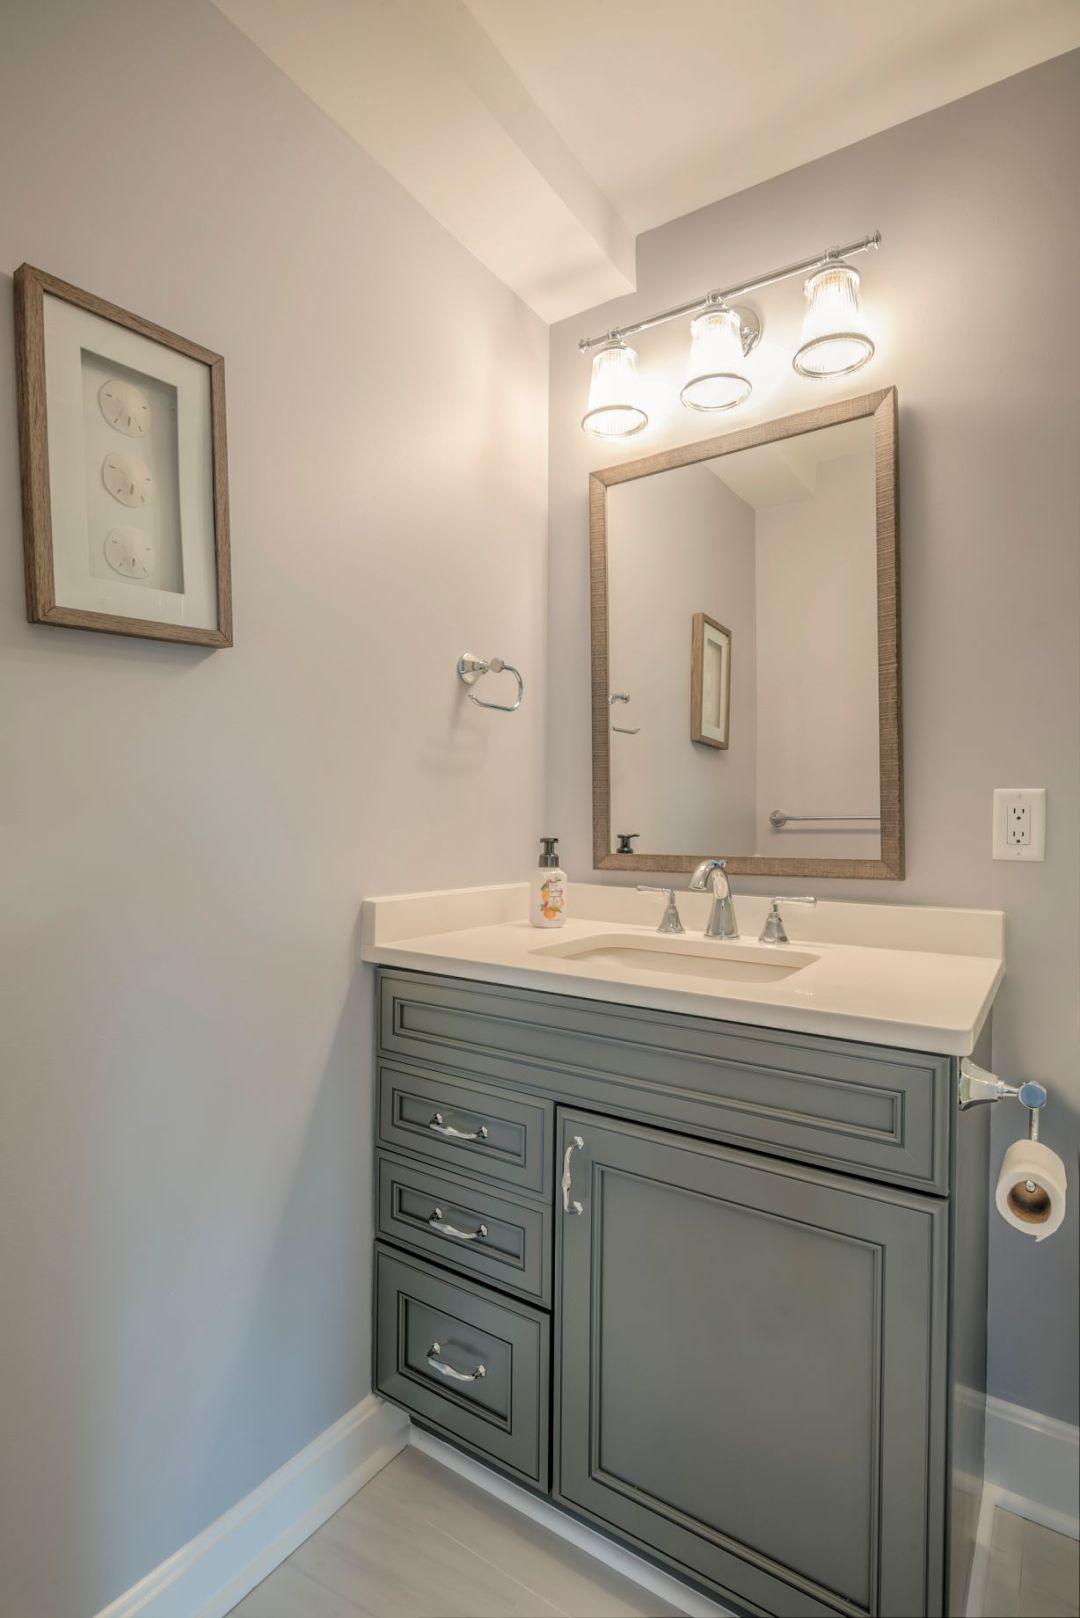 Bathroom Remodel in Kings Grant, Fenwick Island DE with Greyloft Maple Vanities and Square Mirror